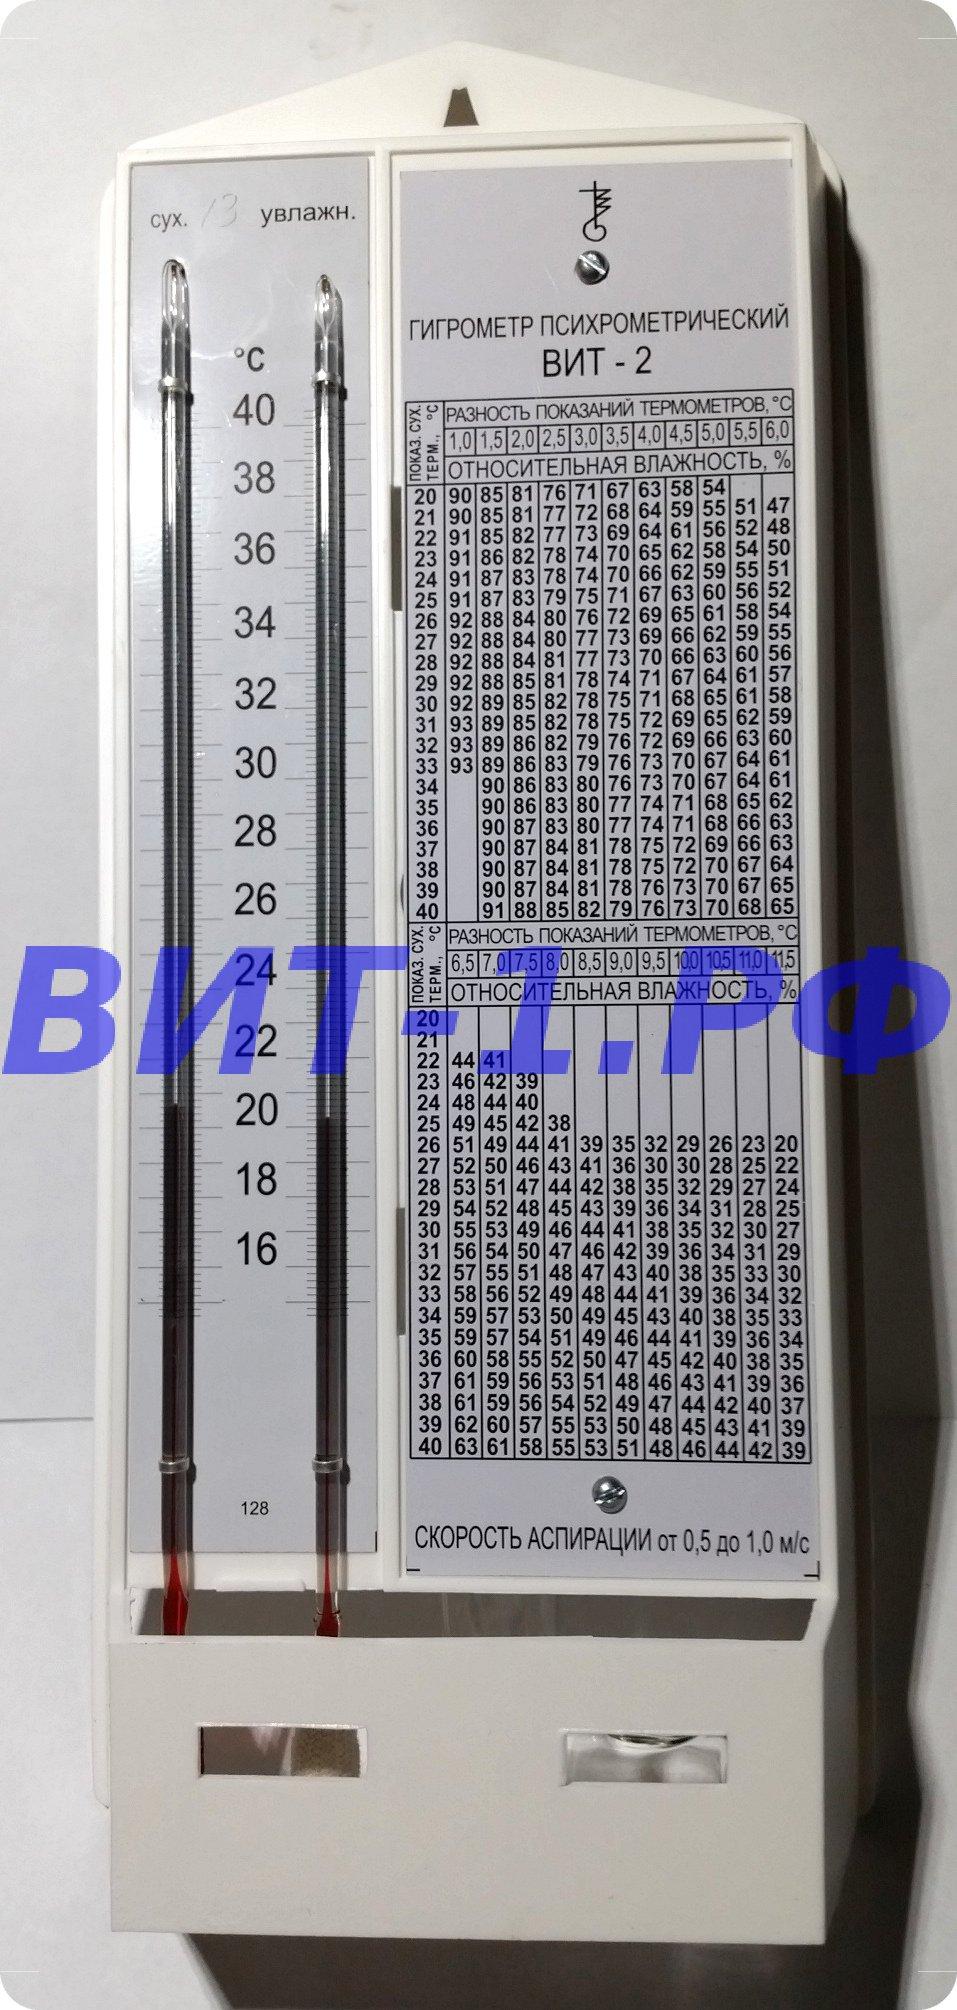 гигрометр психрометрический вит 2 инструкция